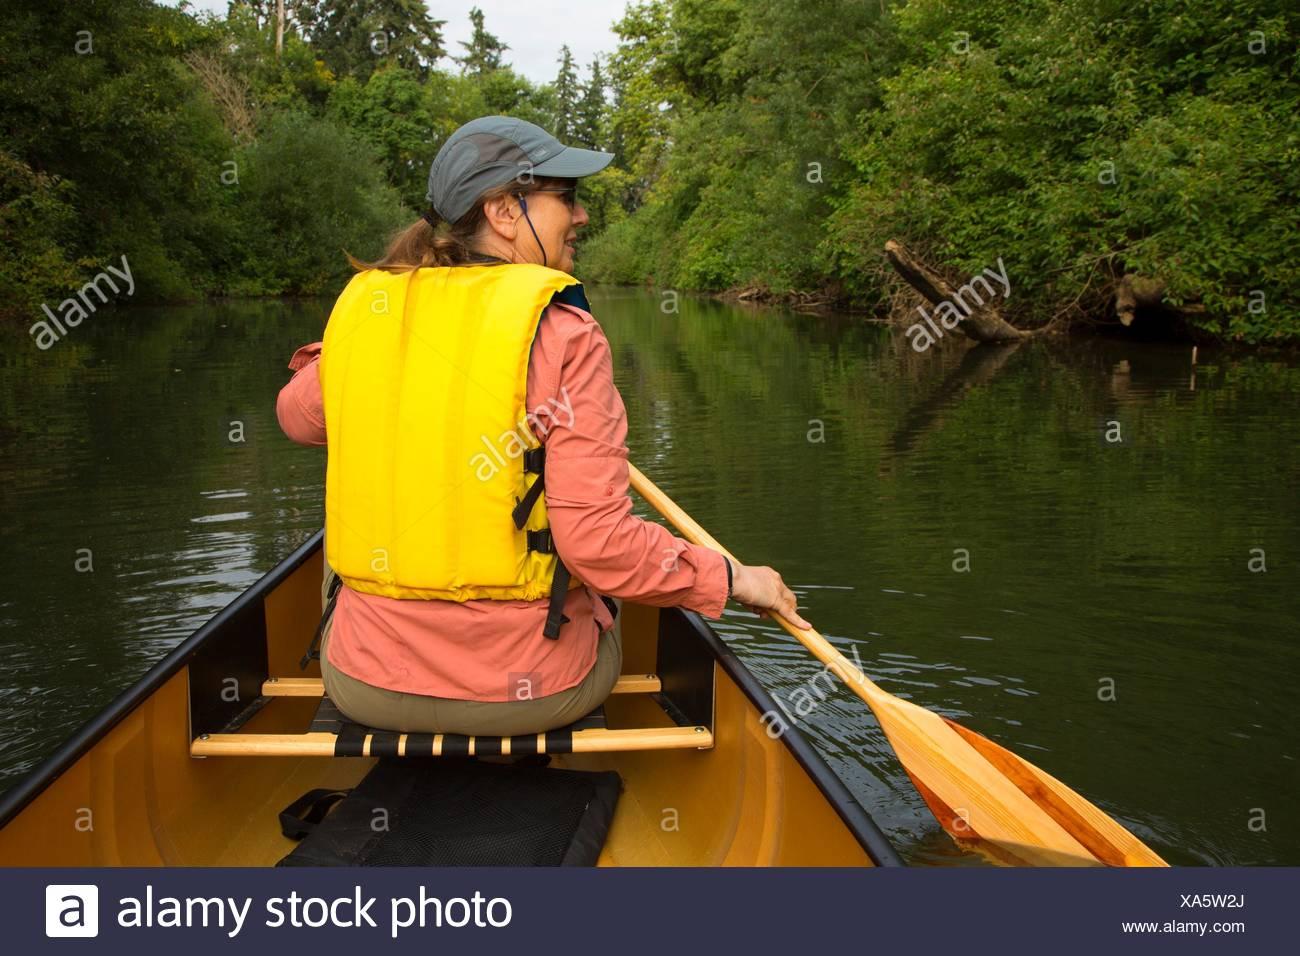 En canoa el río Luckiamute Luckiamute Landing State Park, Oregon. Imagen De Stock